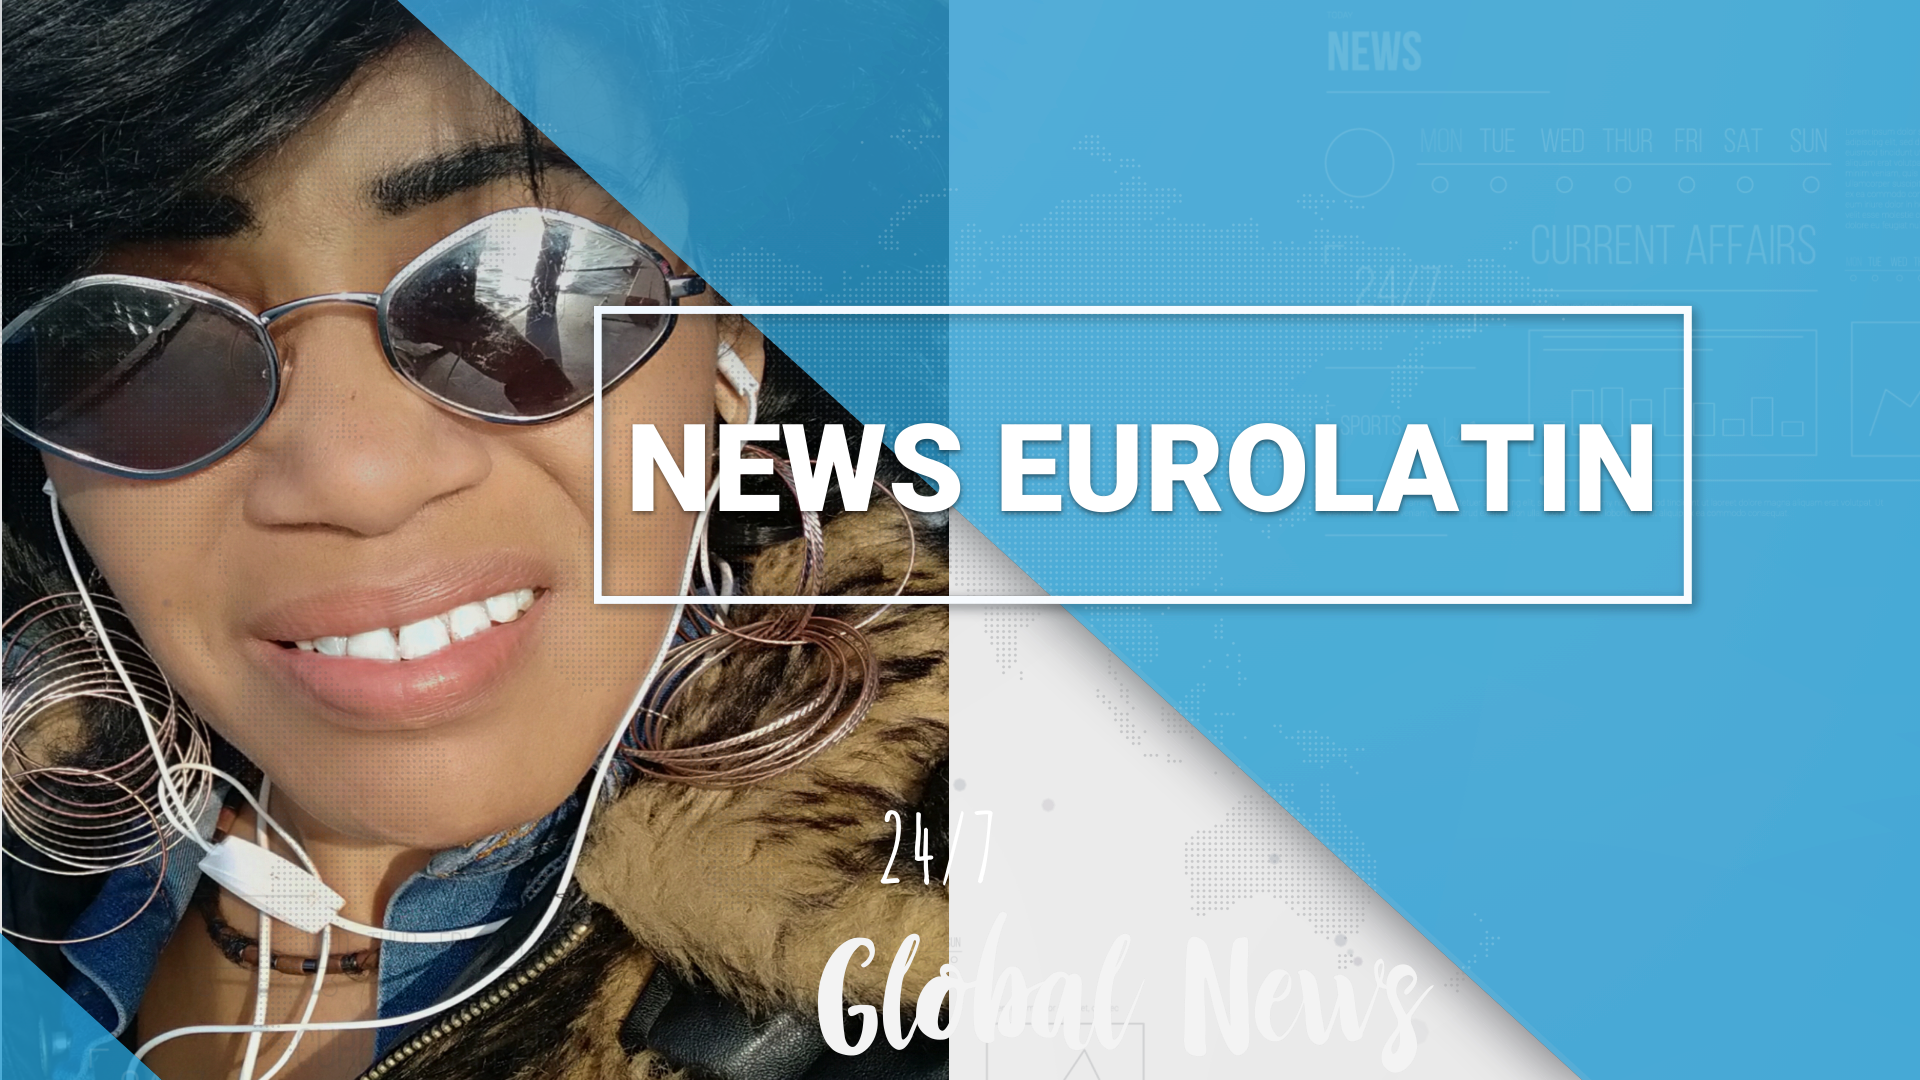 News Eurolatin 24/7